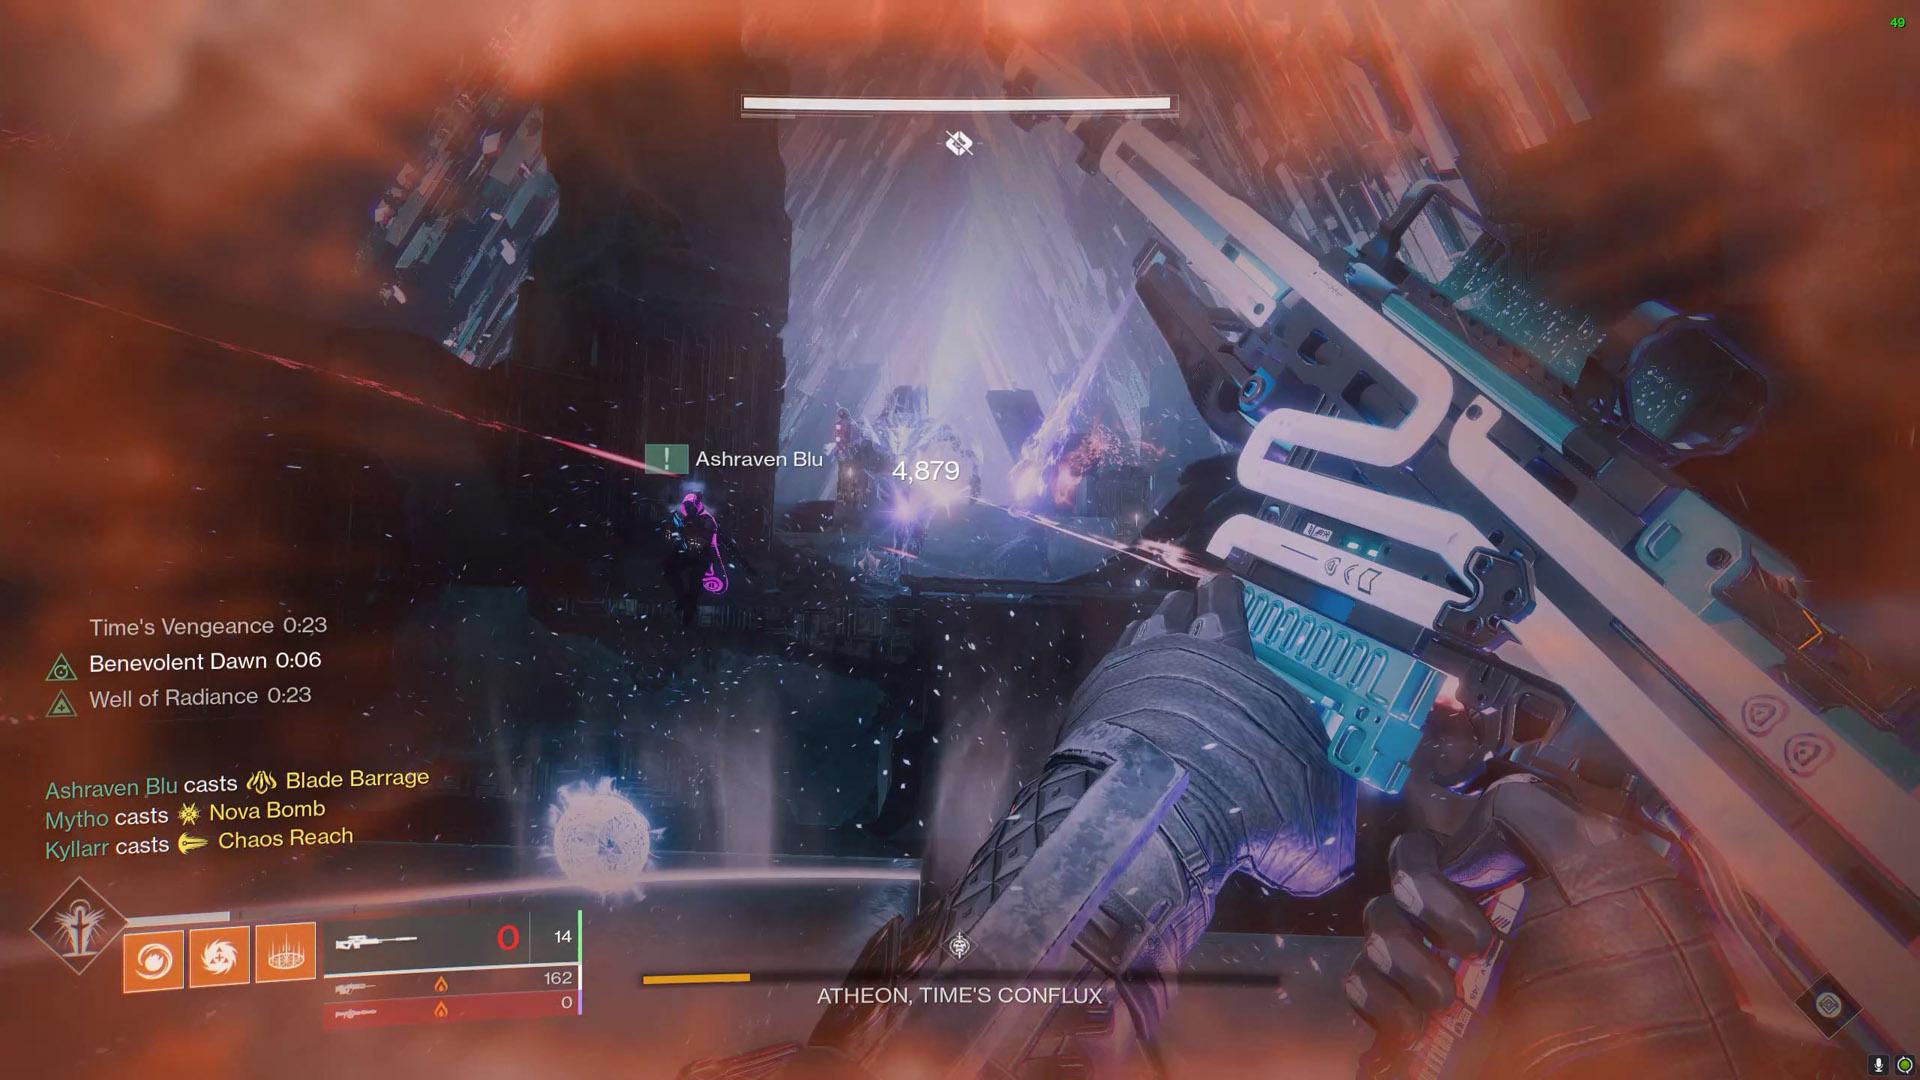 destiny 2 vault of glass atheon damage phase